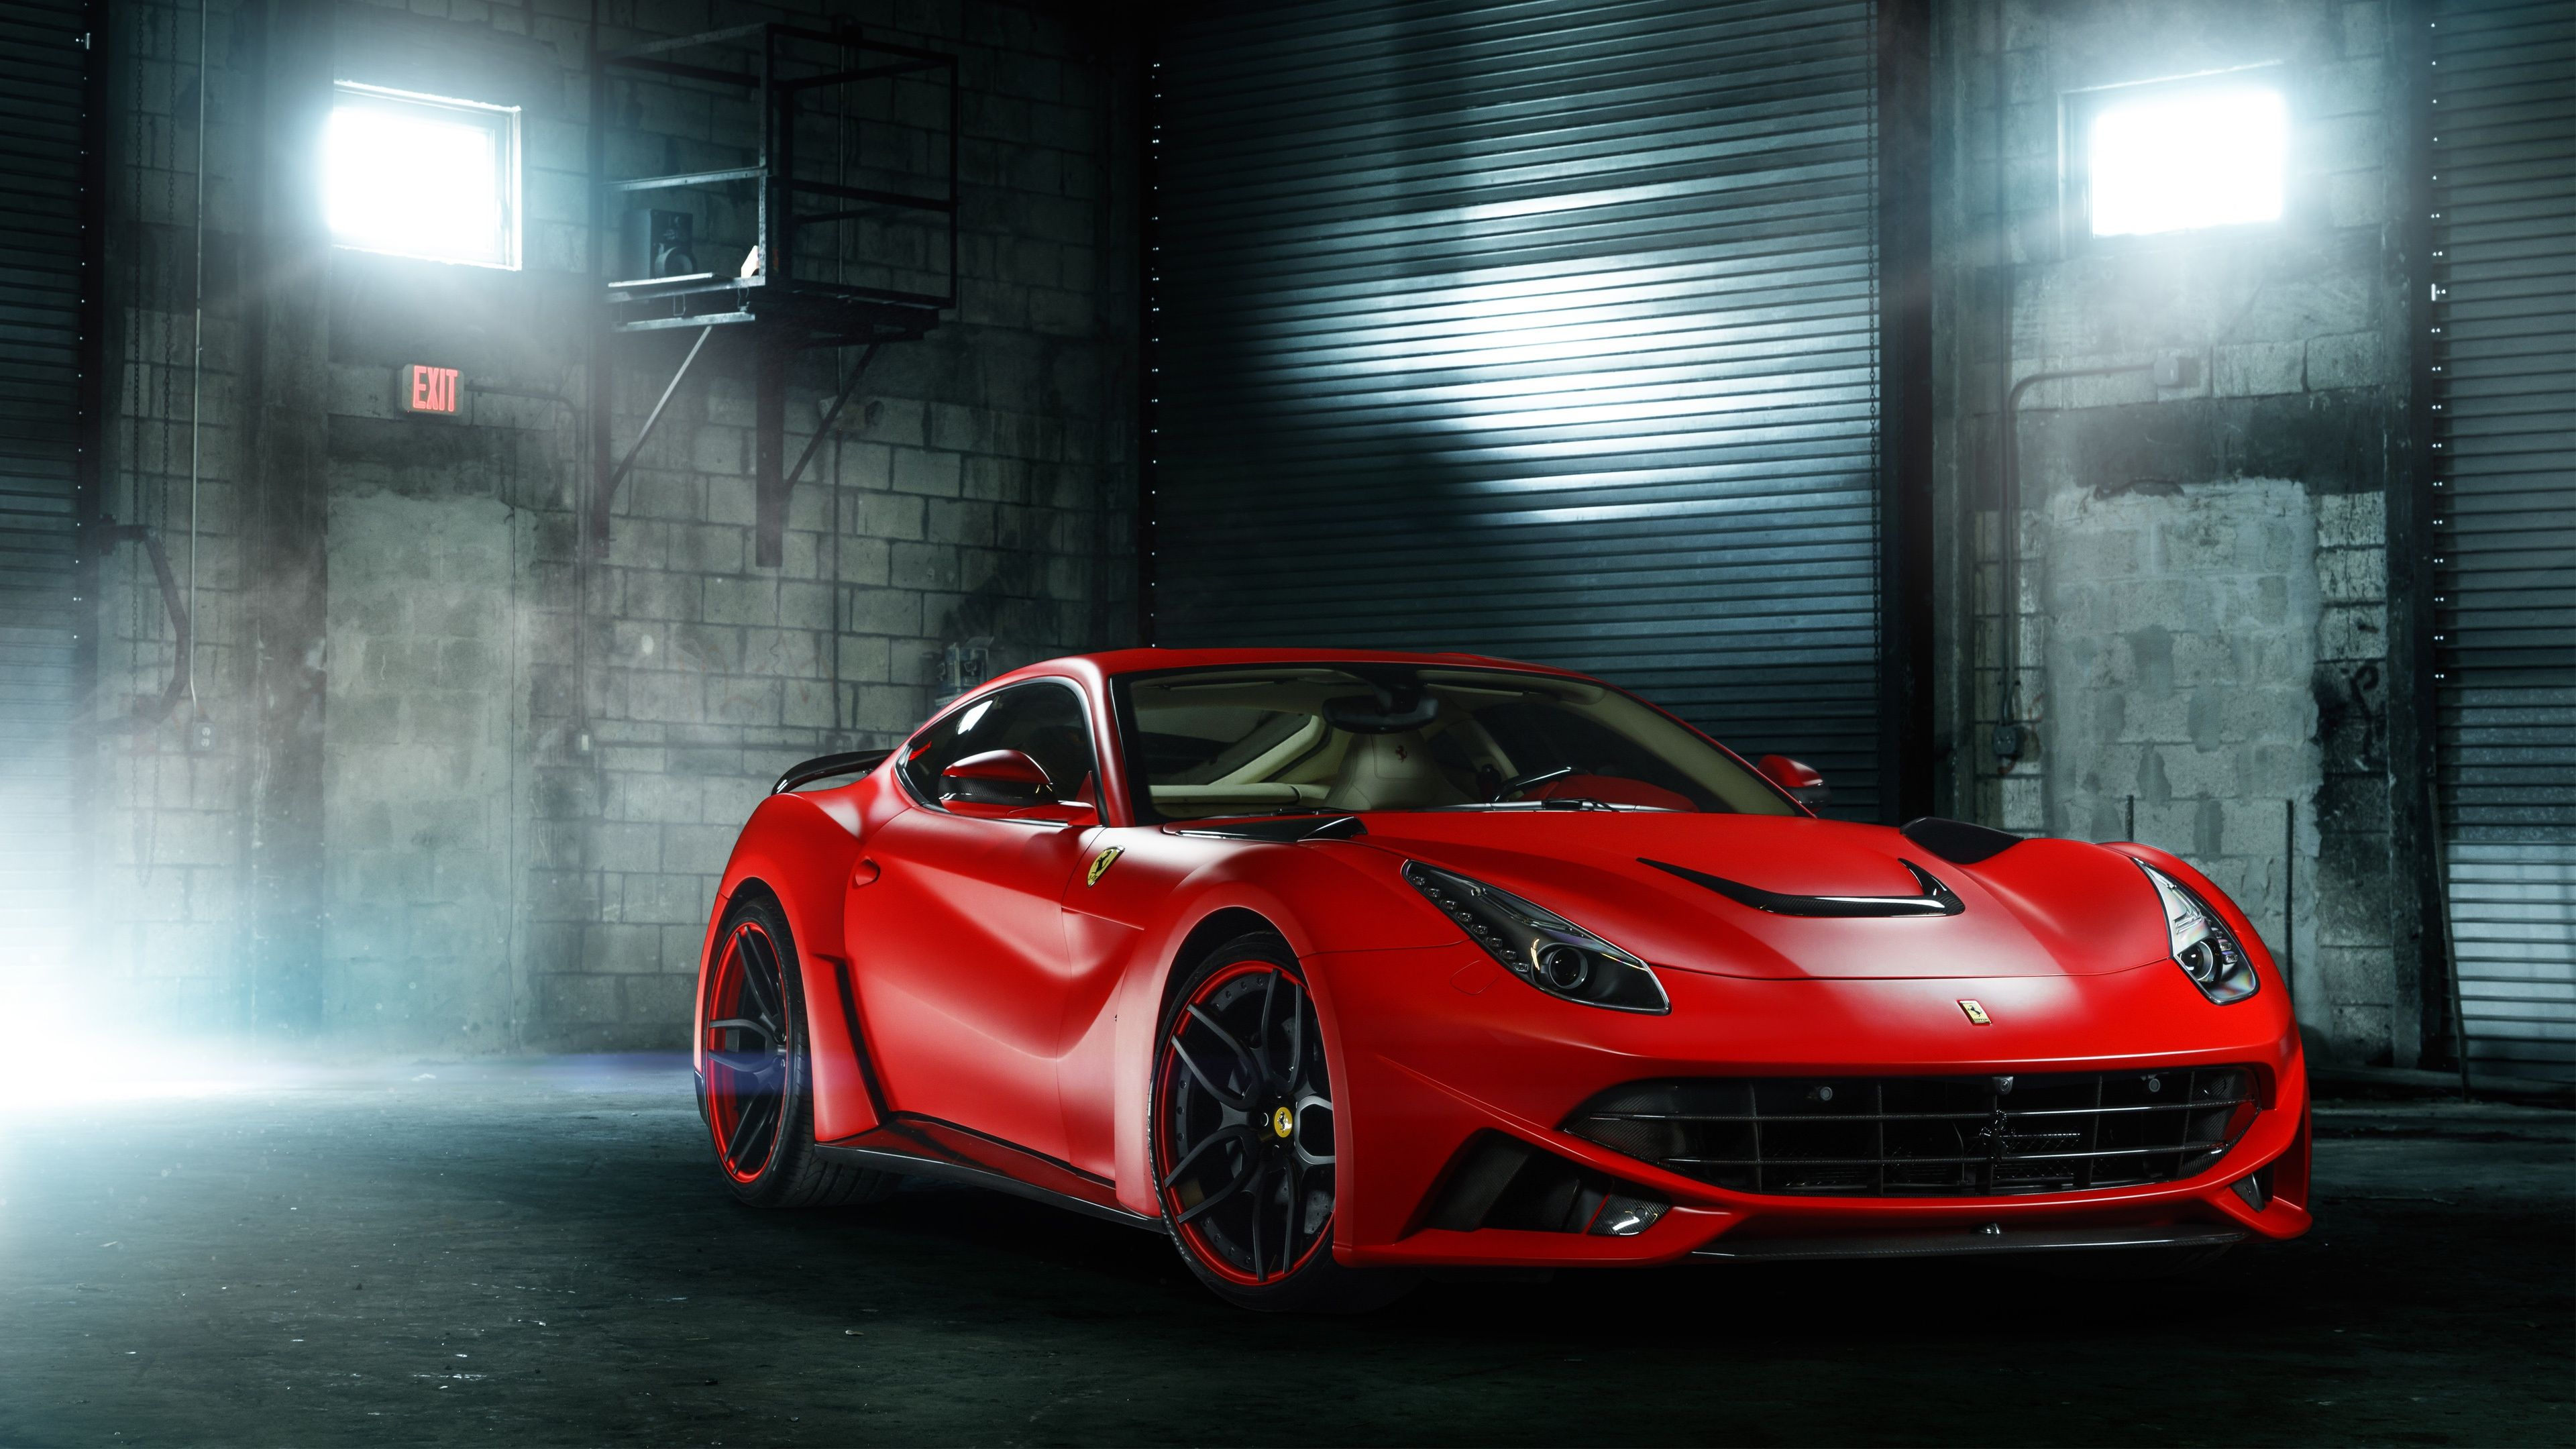 Ultra Hd Ferrari Wallpapers Top Free Ultra Hd Ferrari Backgrounds Wallpaperaccess